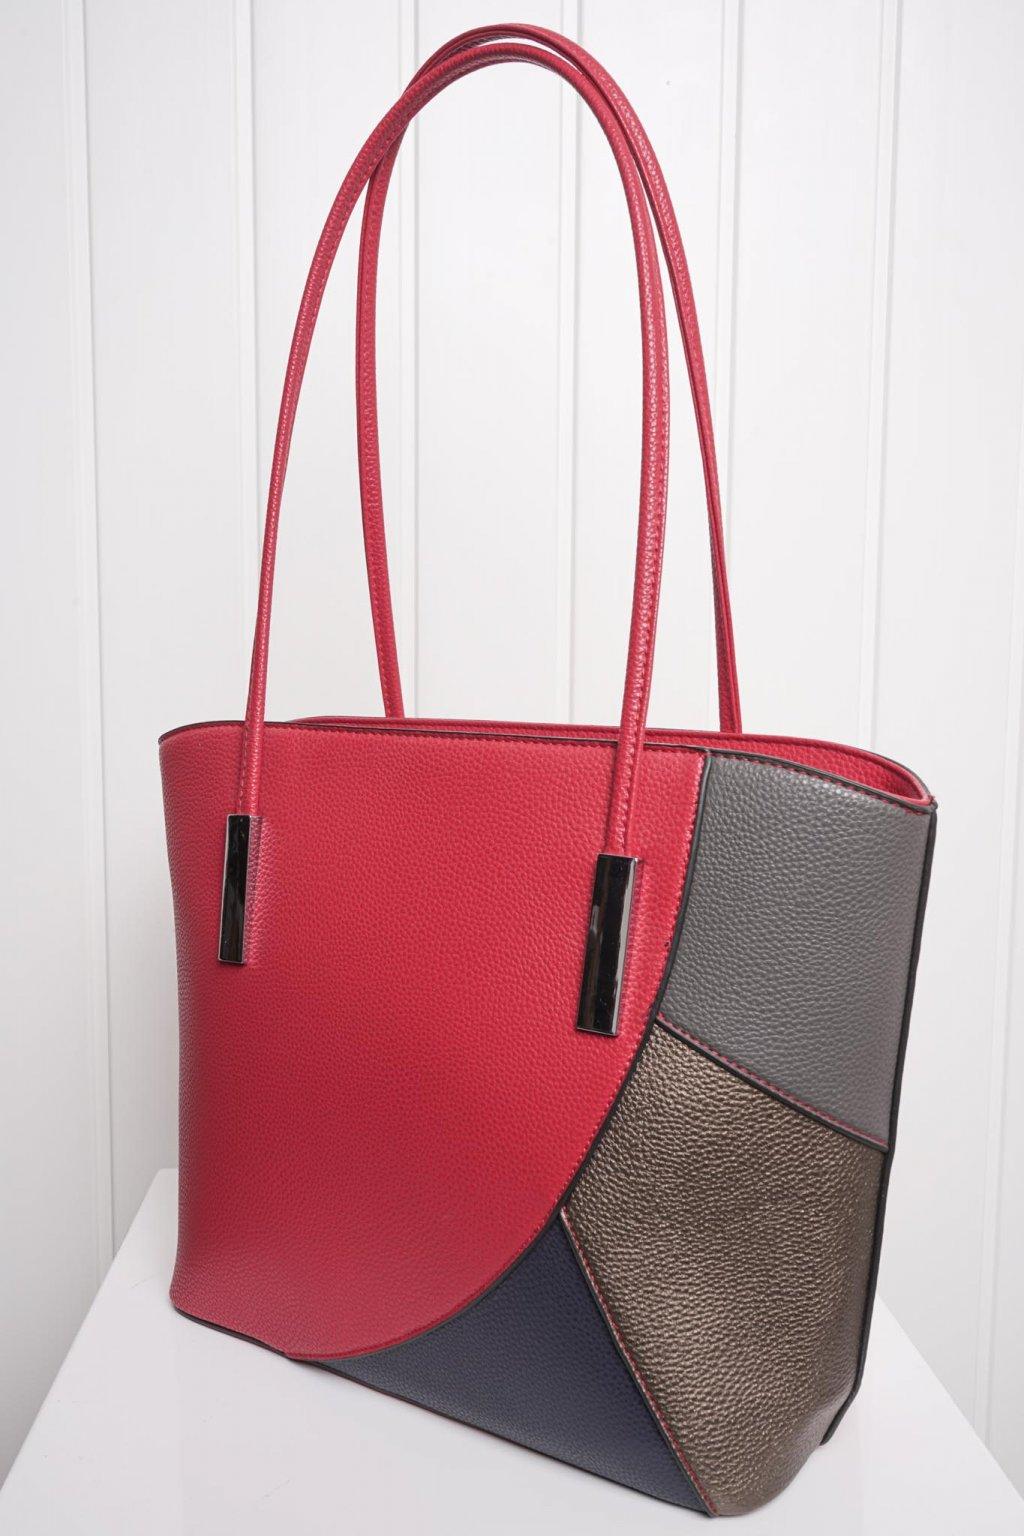 Kabelka, ruksak, dobrá cena, čierna kabelka, čierny ruksak, basic, kabelky, ruksaky 127